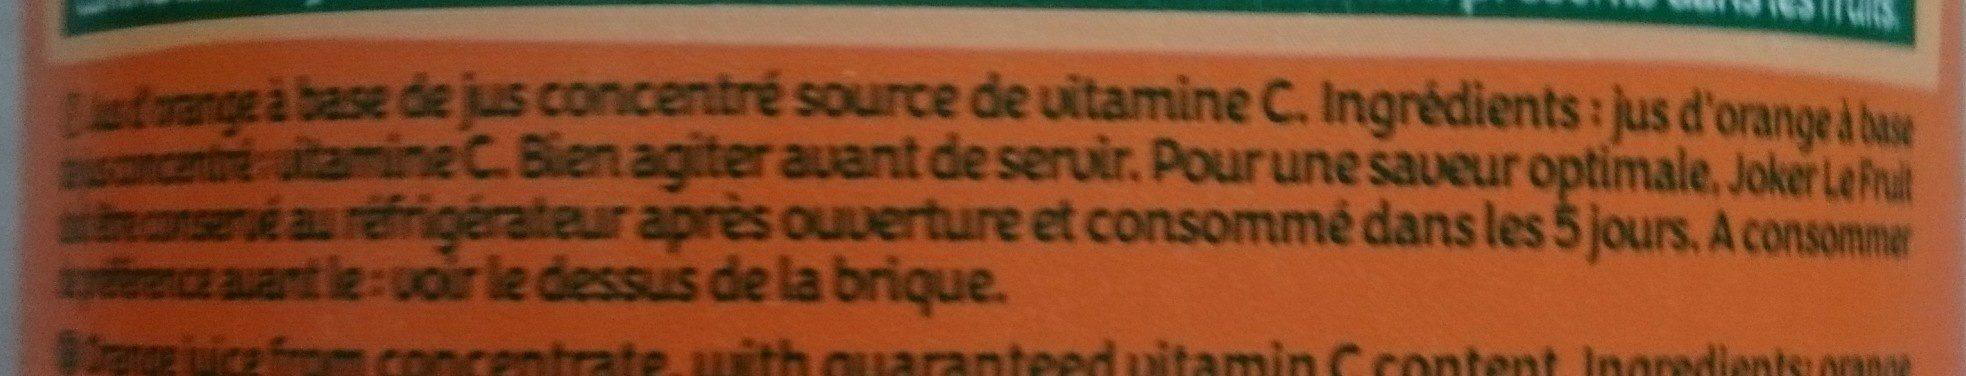 Le fruit - Ingrediënten